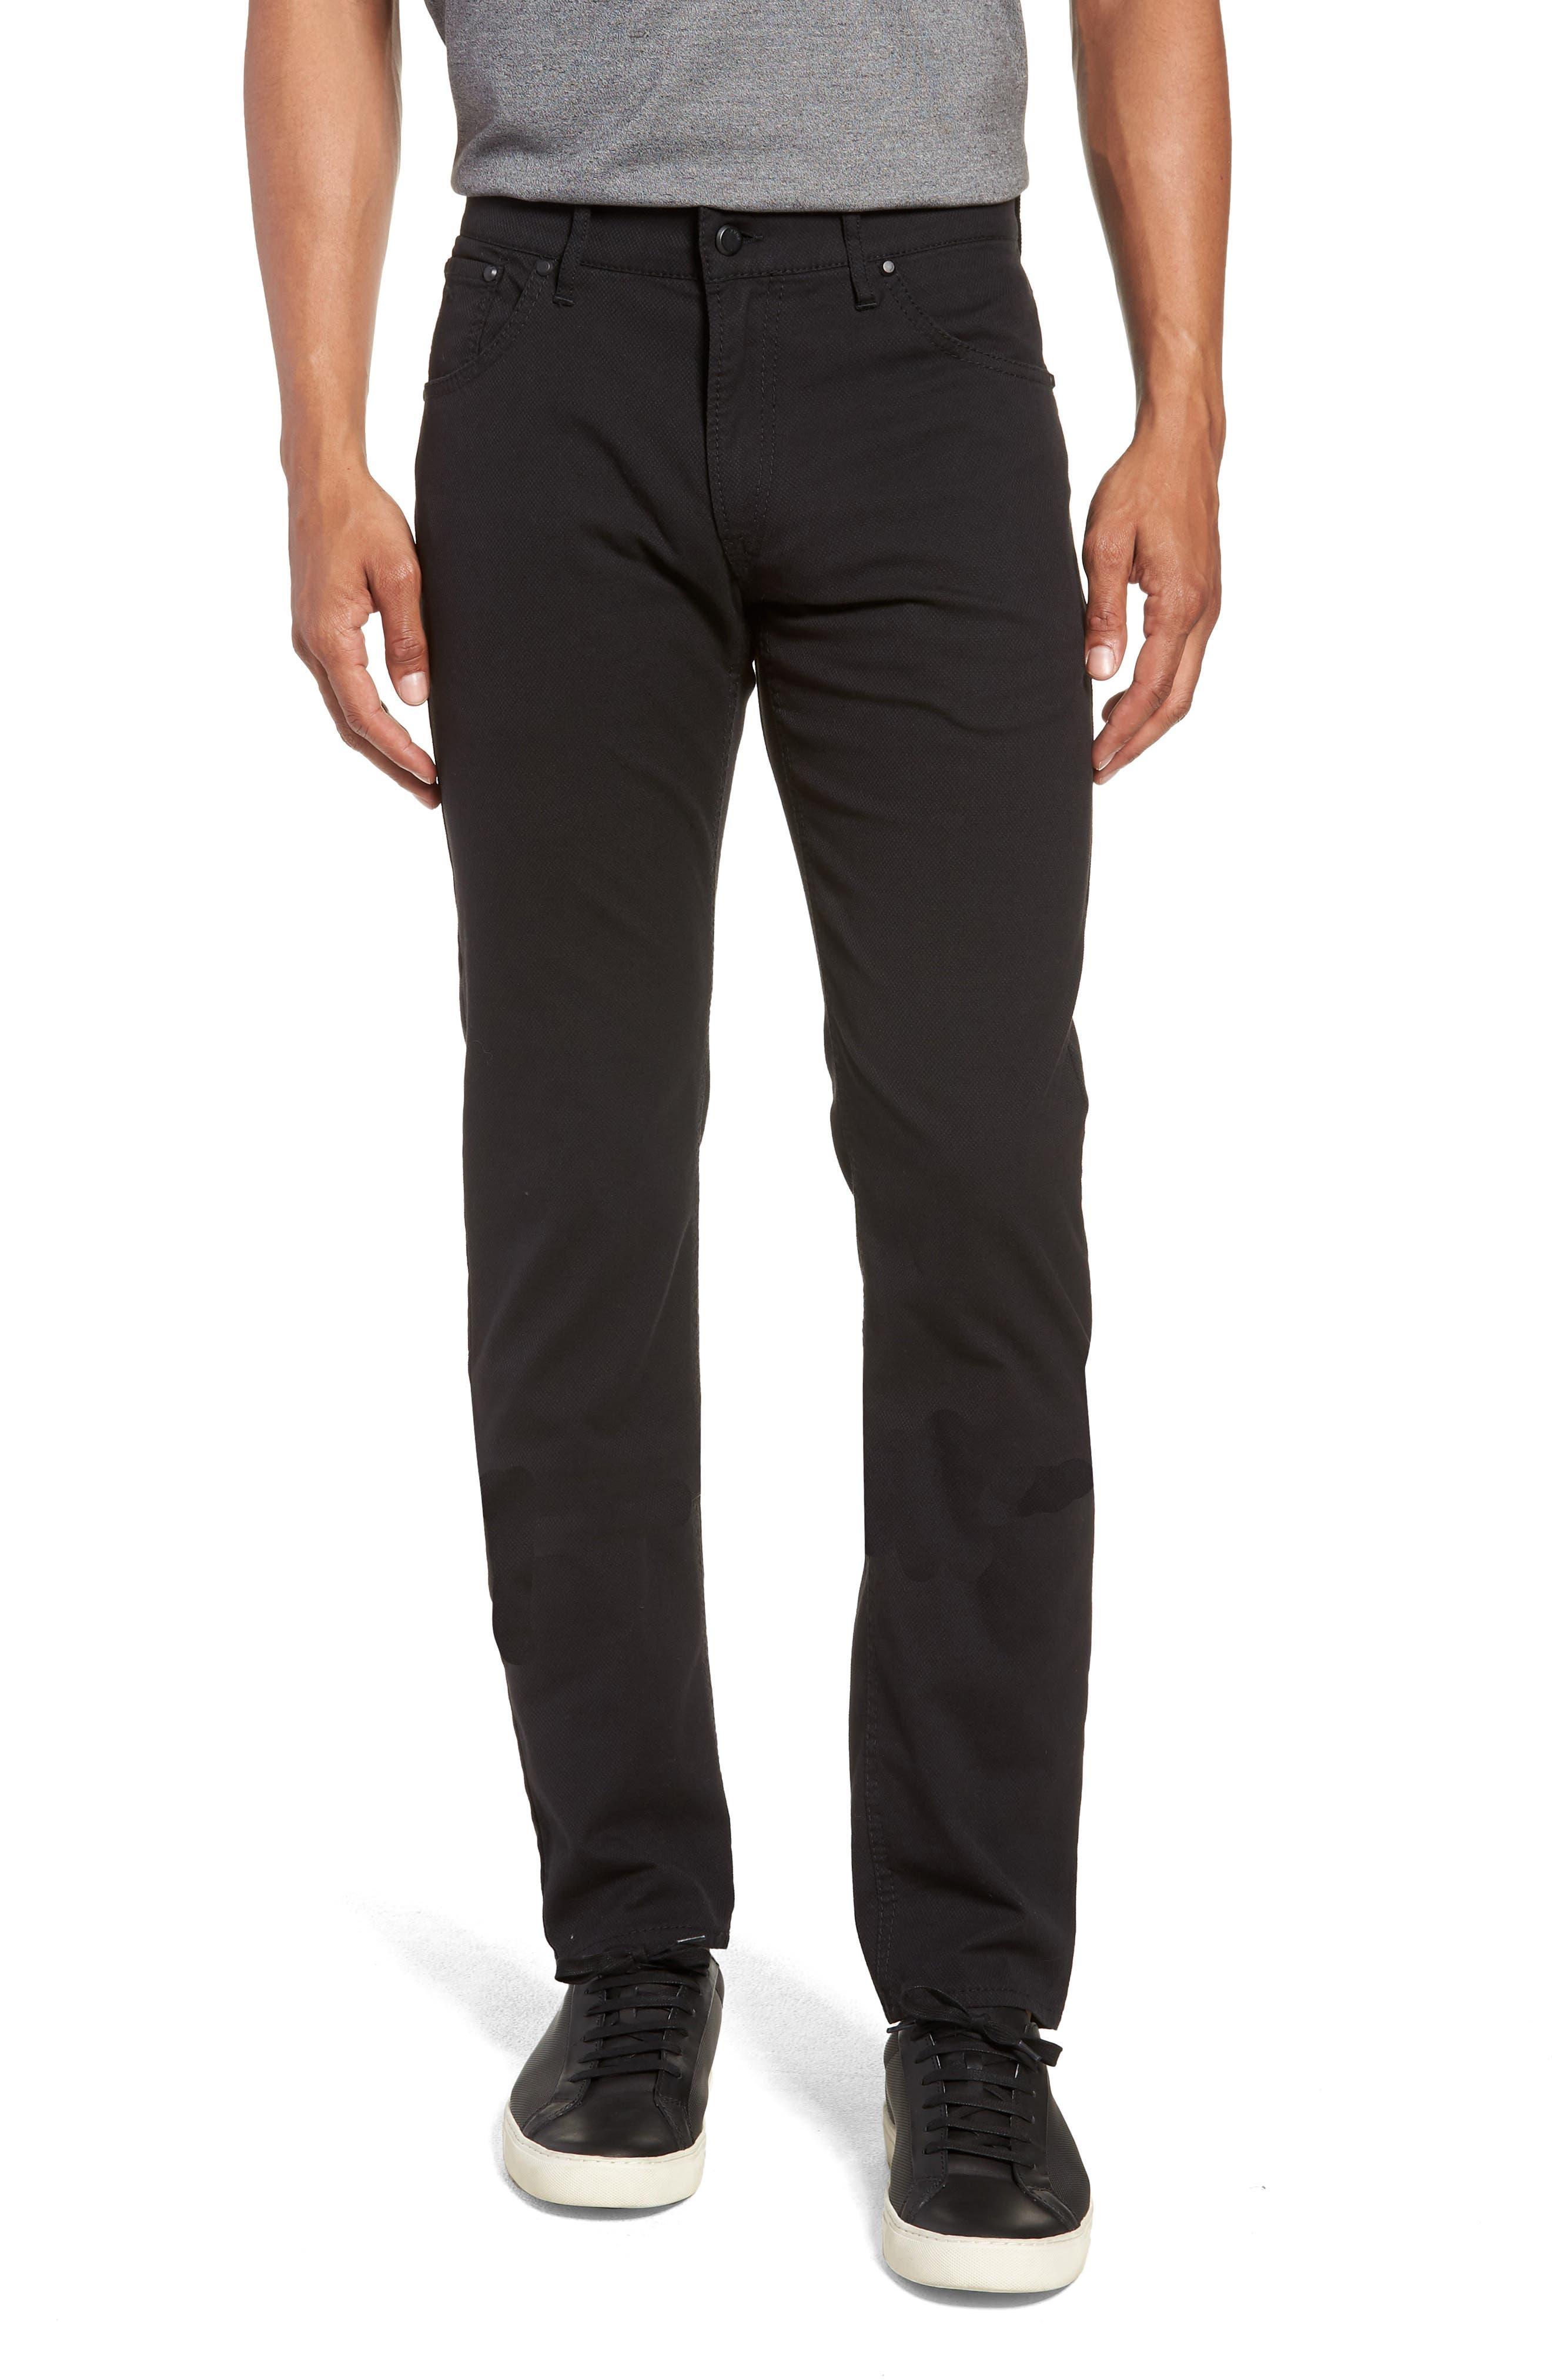 Woolook Diamond Slim Fit Pants,                             Main thumbnail 1, color,                             BLACK